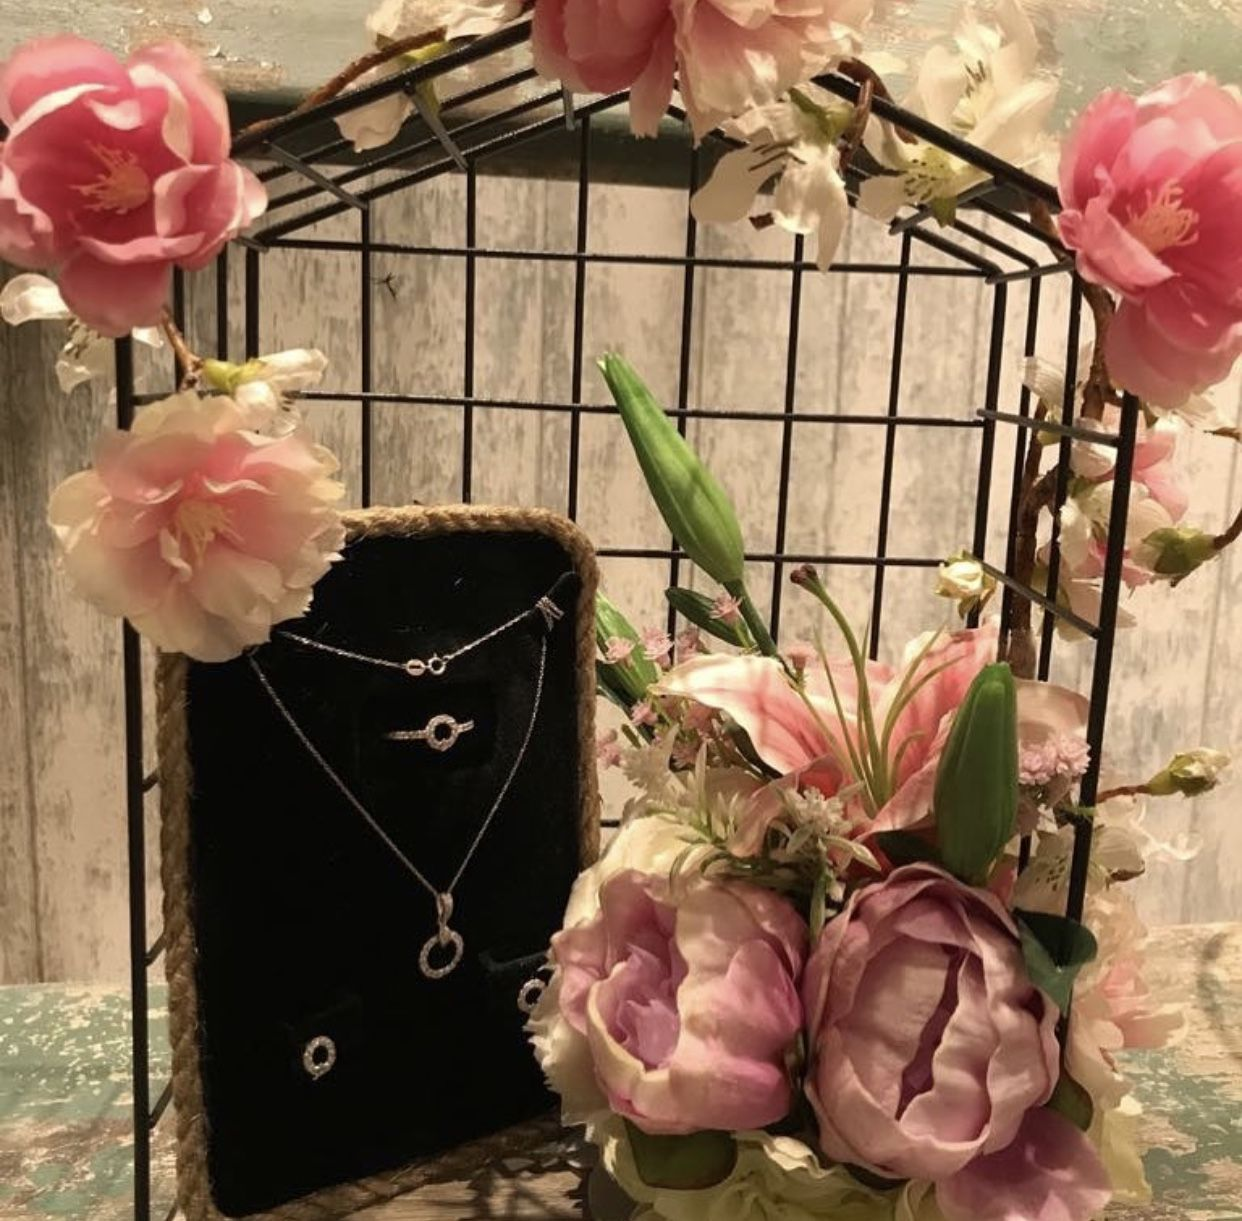 أعمال ديكور بالورد Creative Christmas Gifts Wedding Jewellery Boxes Wedding Boxes